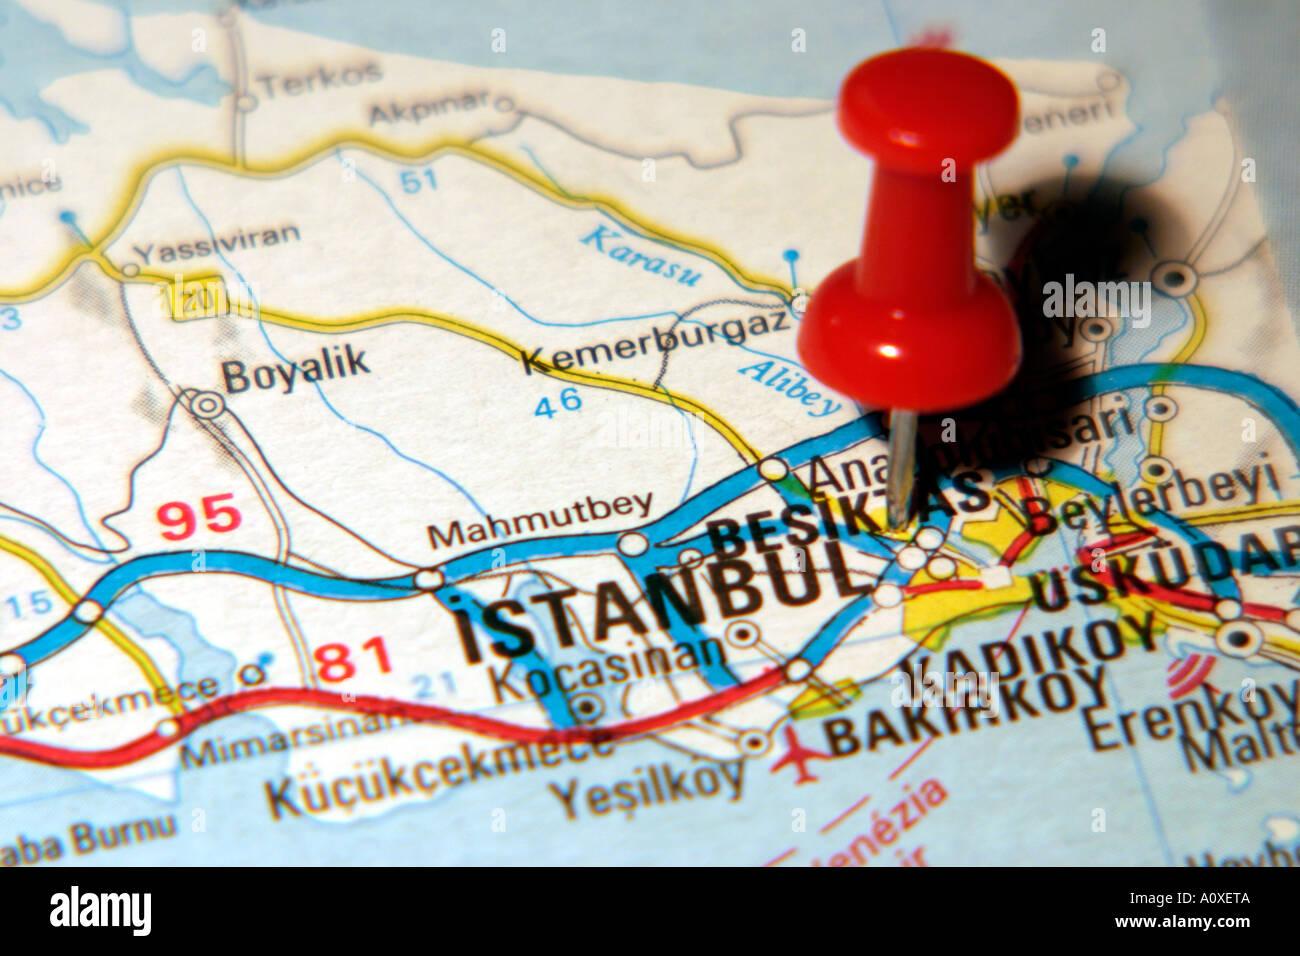 Road Map Istanbul Turkey Stock Photos & Road Map Istanbul Turkey ...